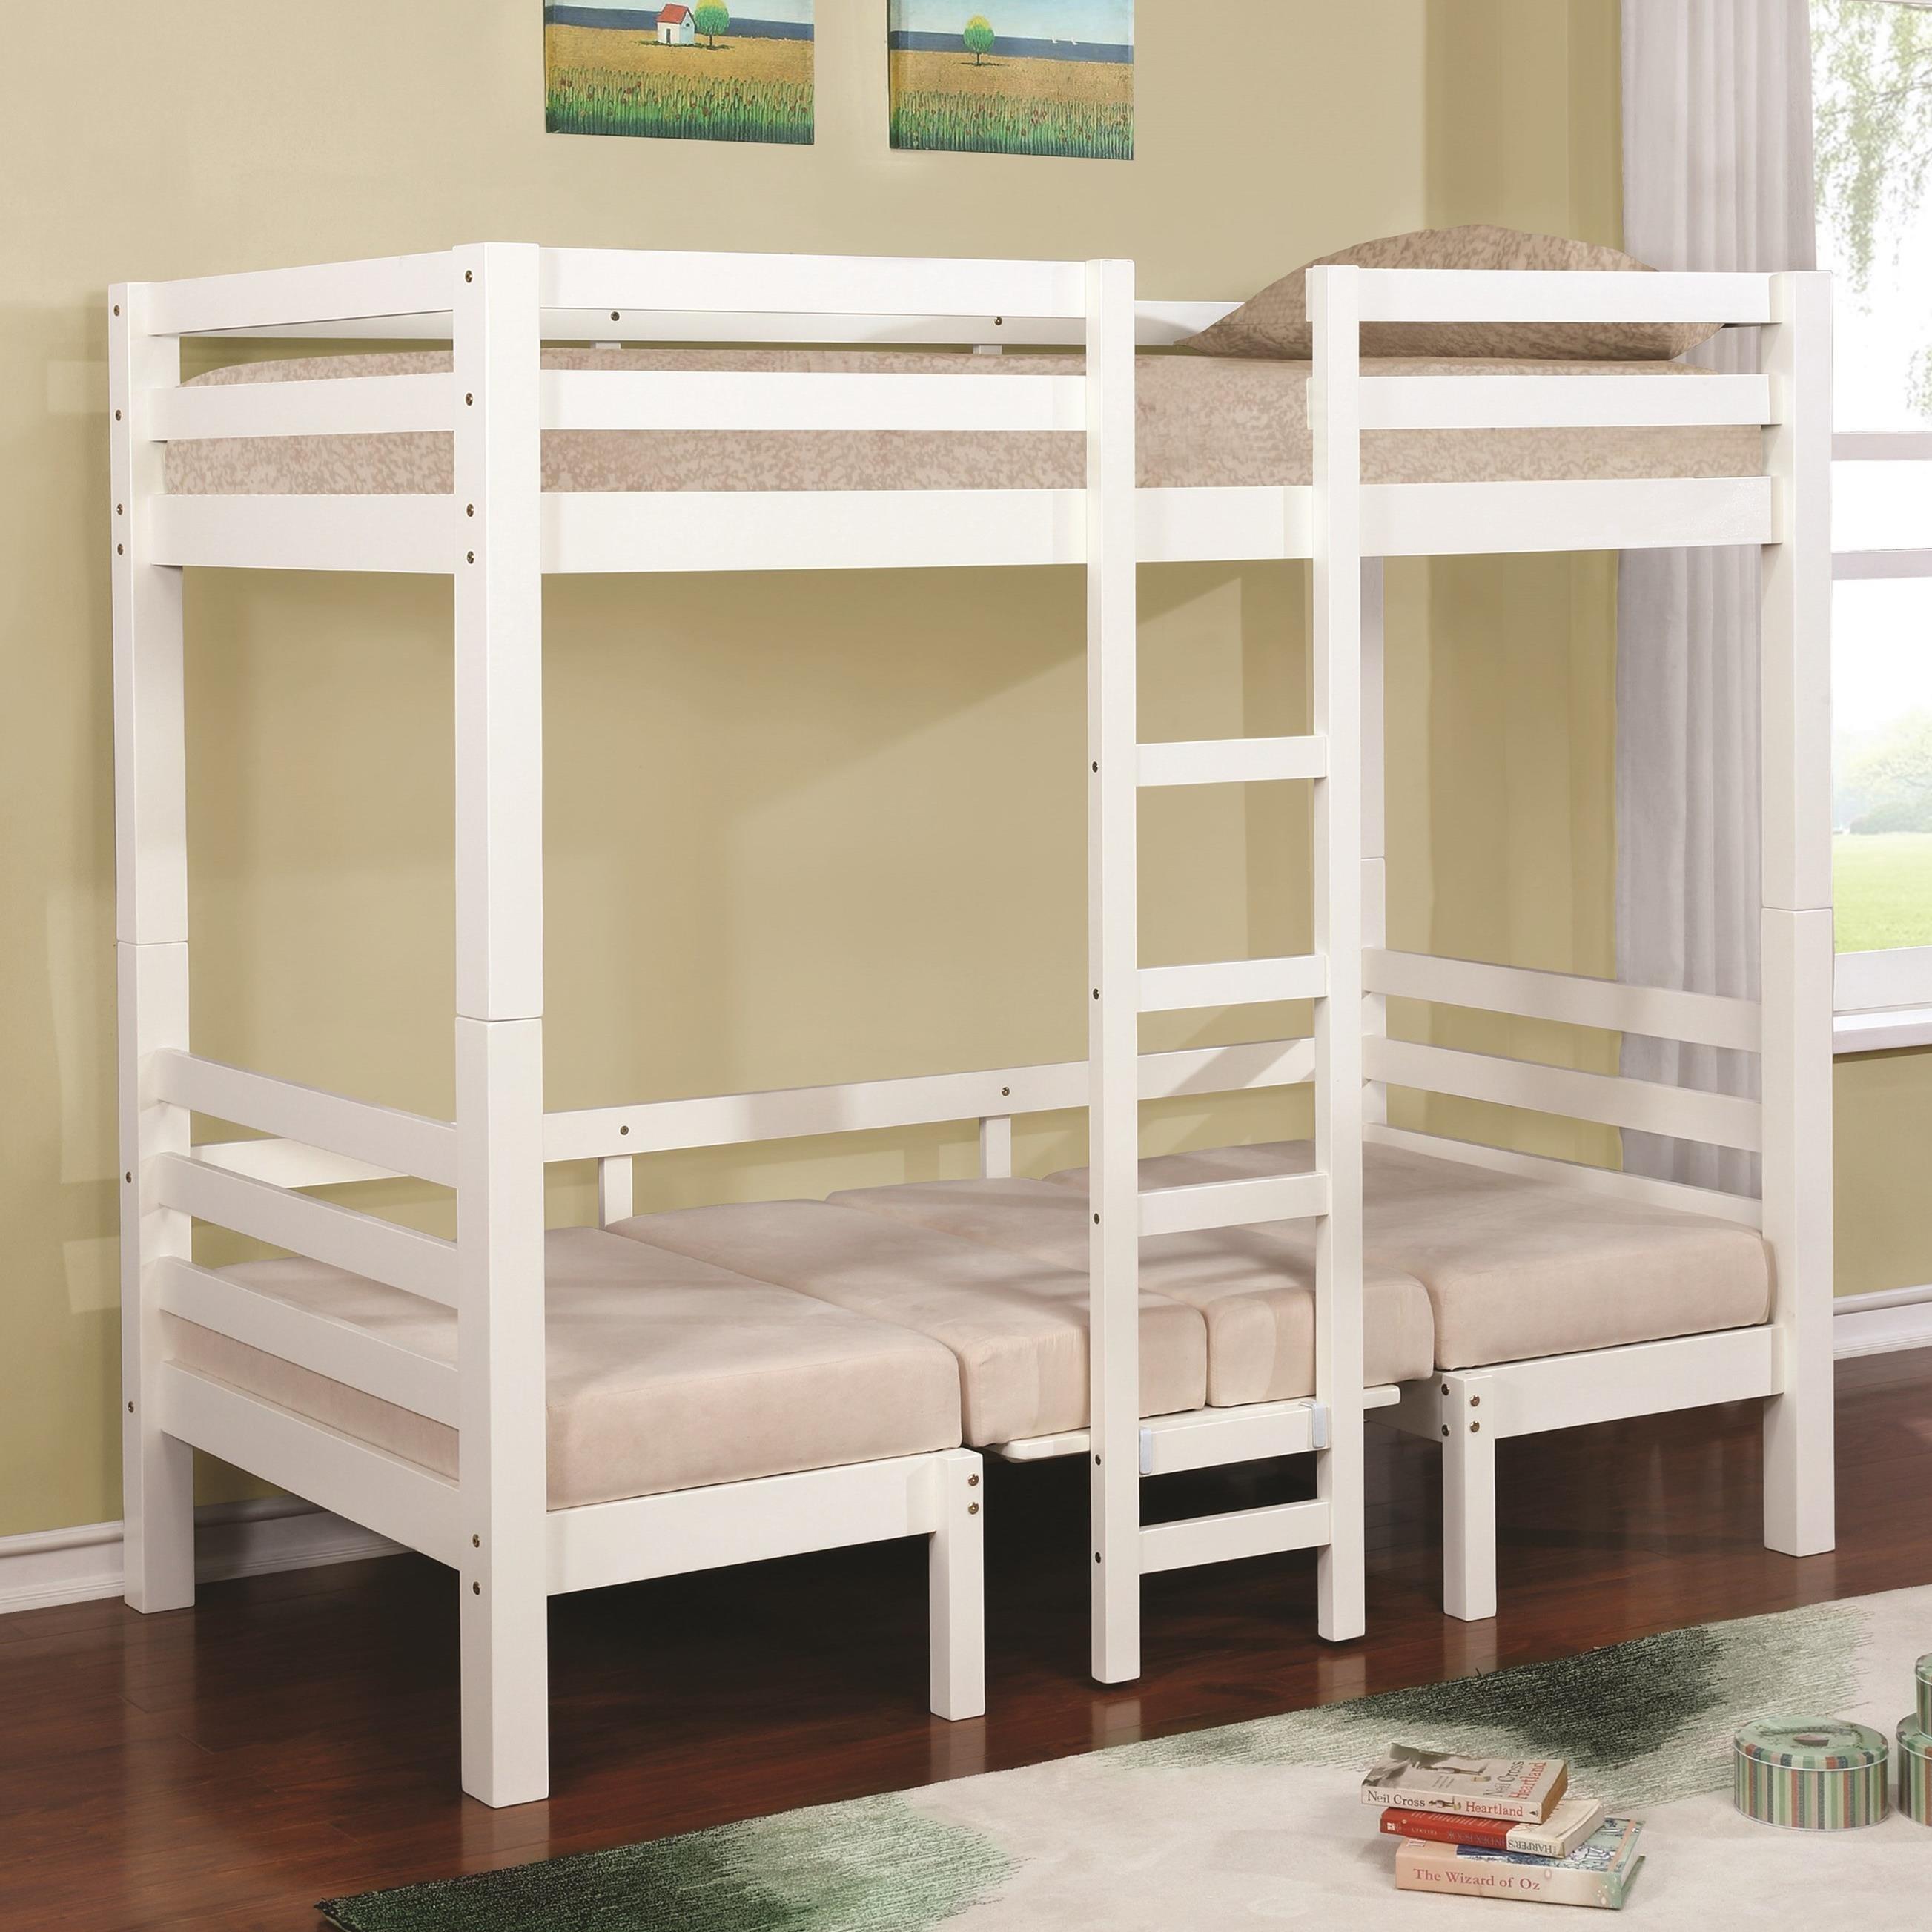 742891663e5f8 Coaster Bunks Twin Over Twin Convertible Loft Bed